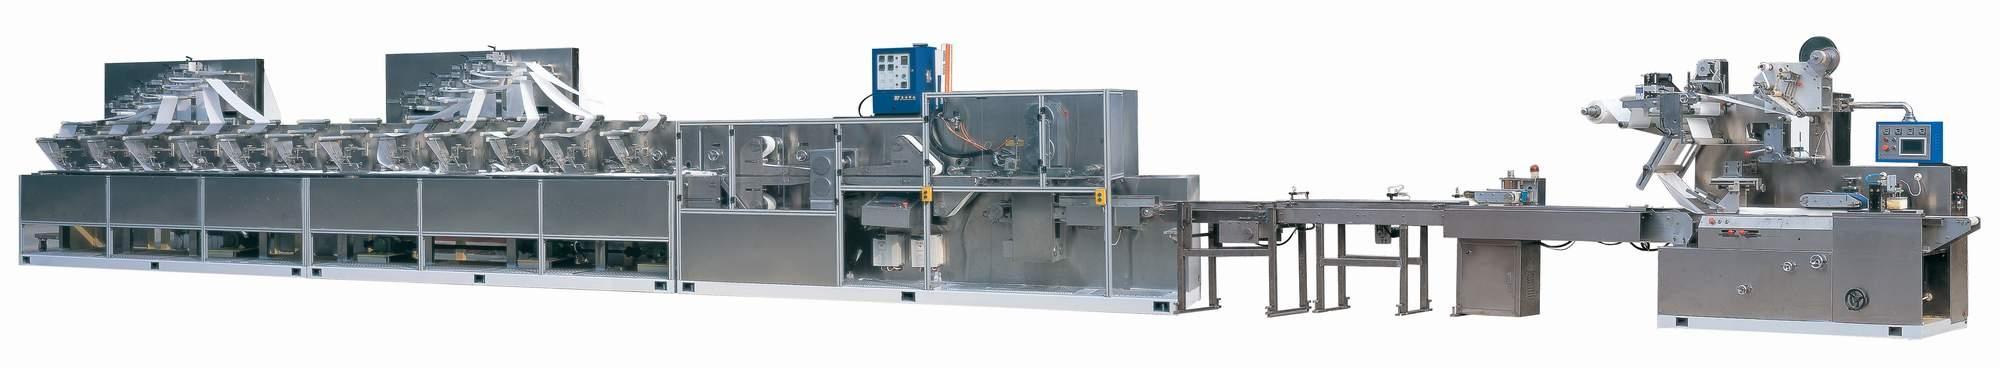 wet tissue making and packing machine, wet wipes making and packing machine